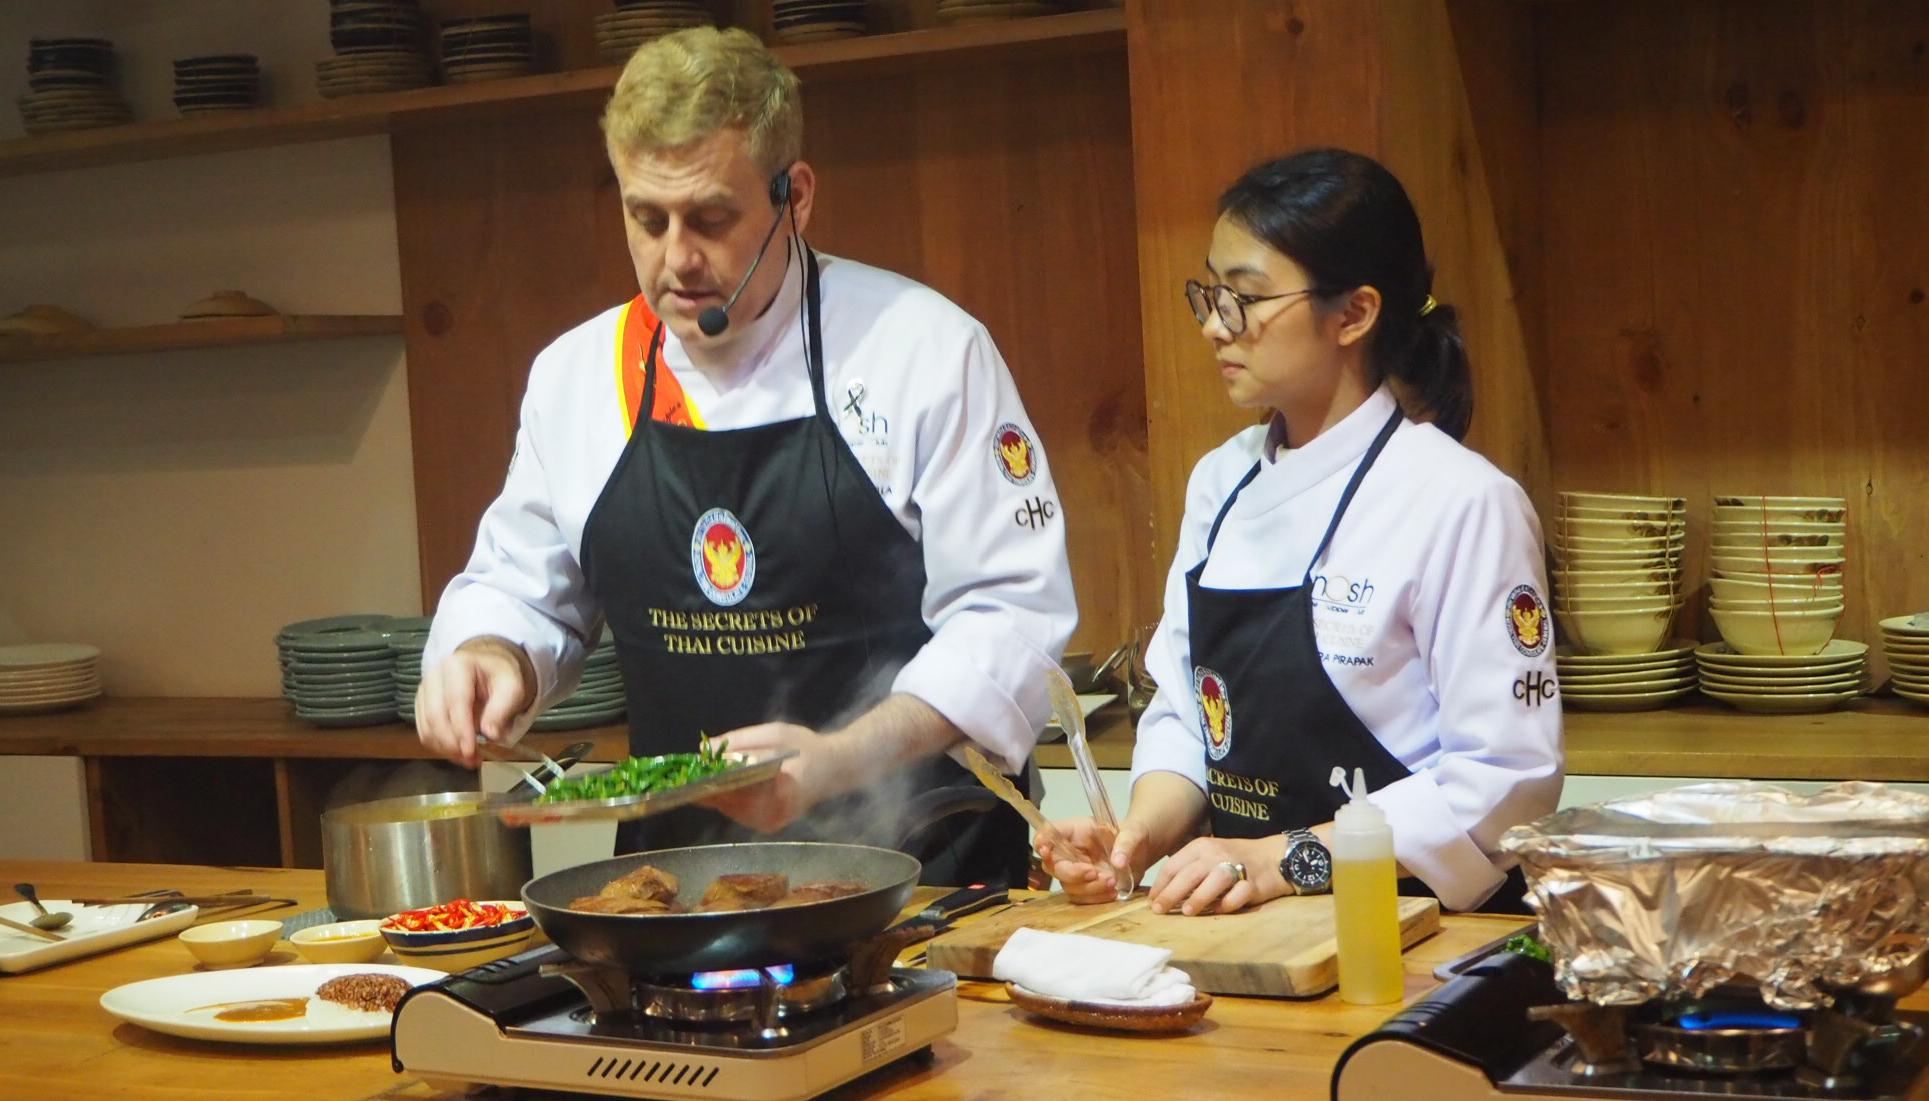 Secrets of Thai cuisine revealed to Saigon audience